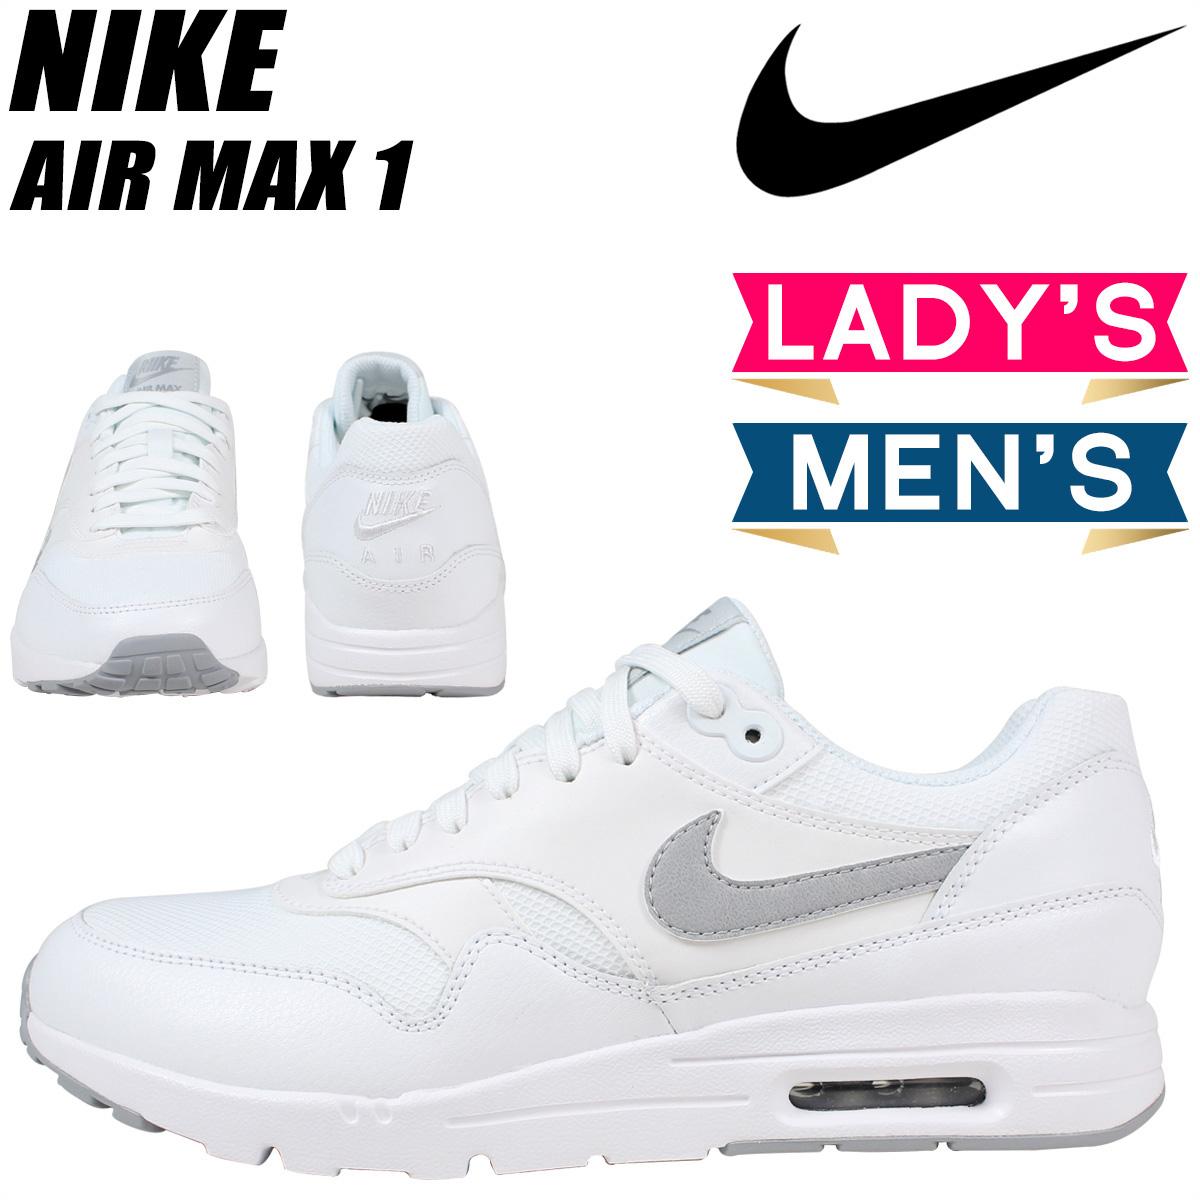 NIKE ナイキ エアマックス スニーカー レディース WMNS AIR MAX 1 ULTRA ESSENTIALS エア マックス 1 エッセンシャル 704993-102 メンズ 靴 ホワイト